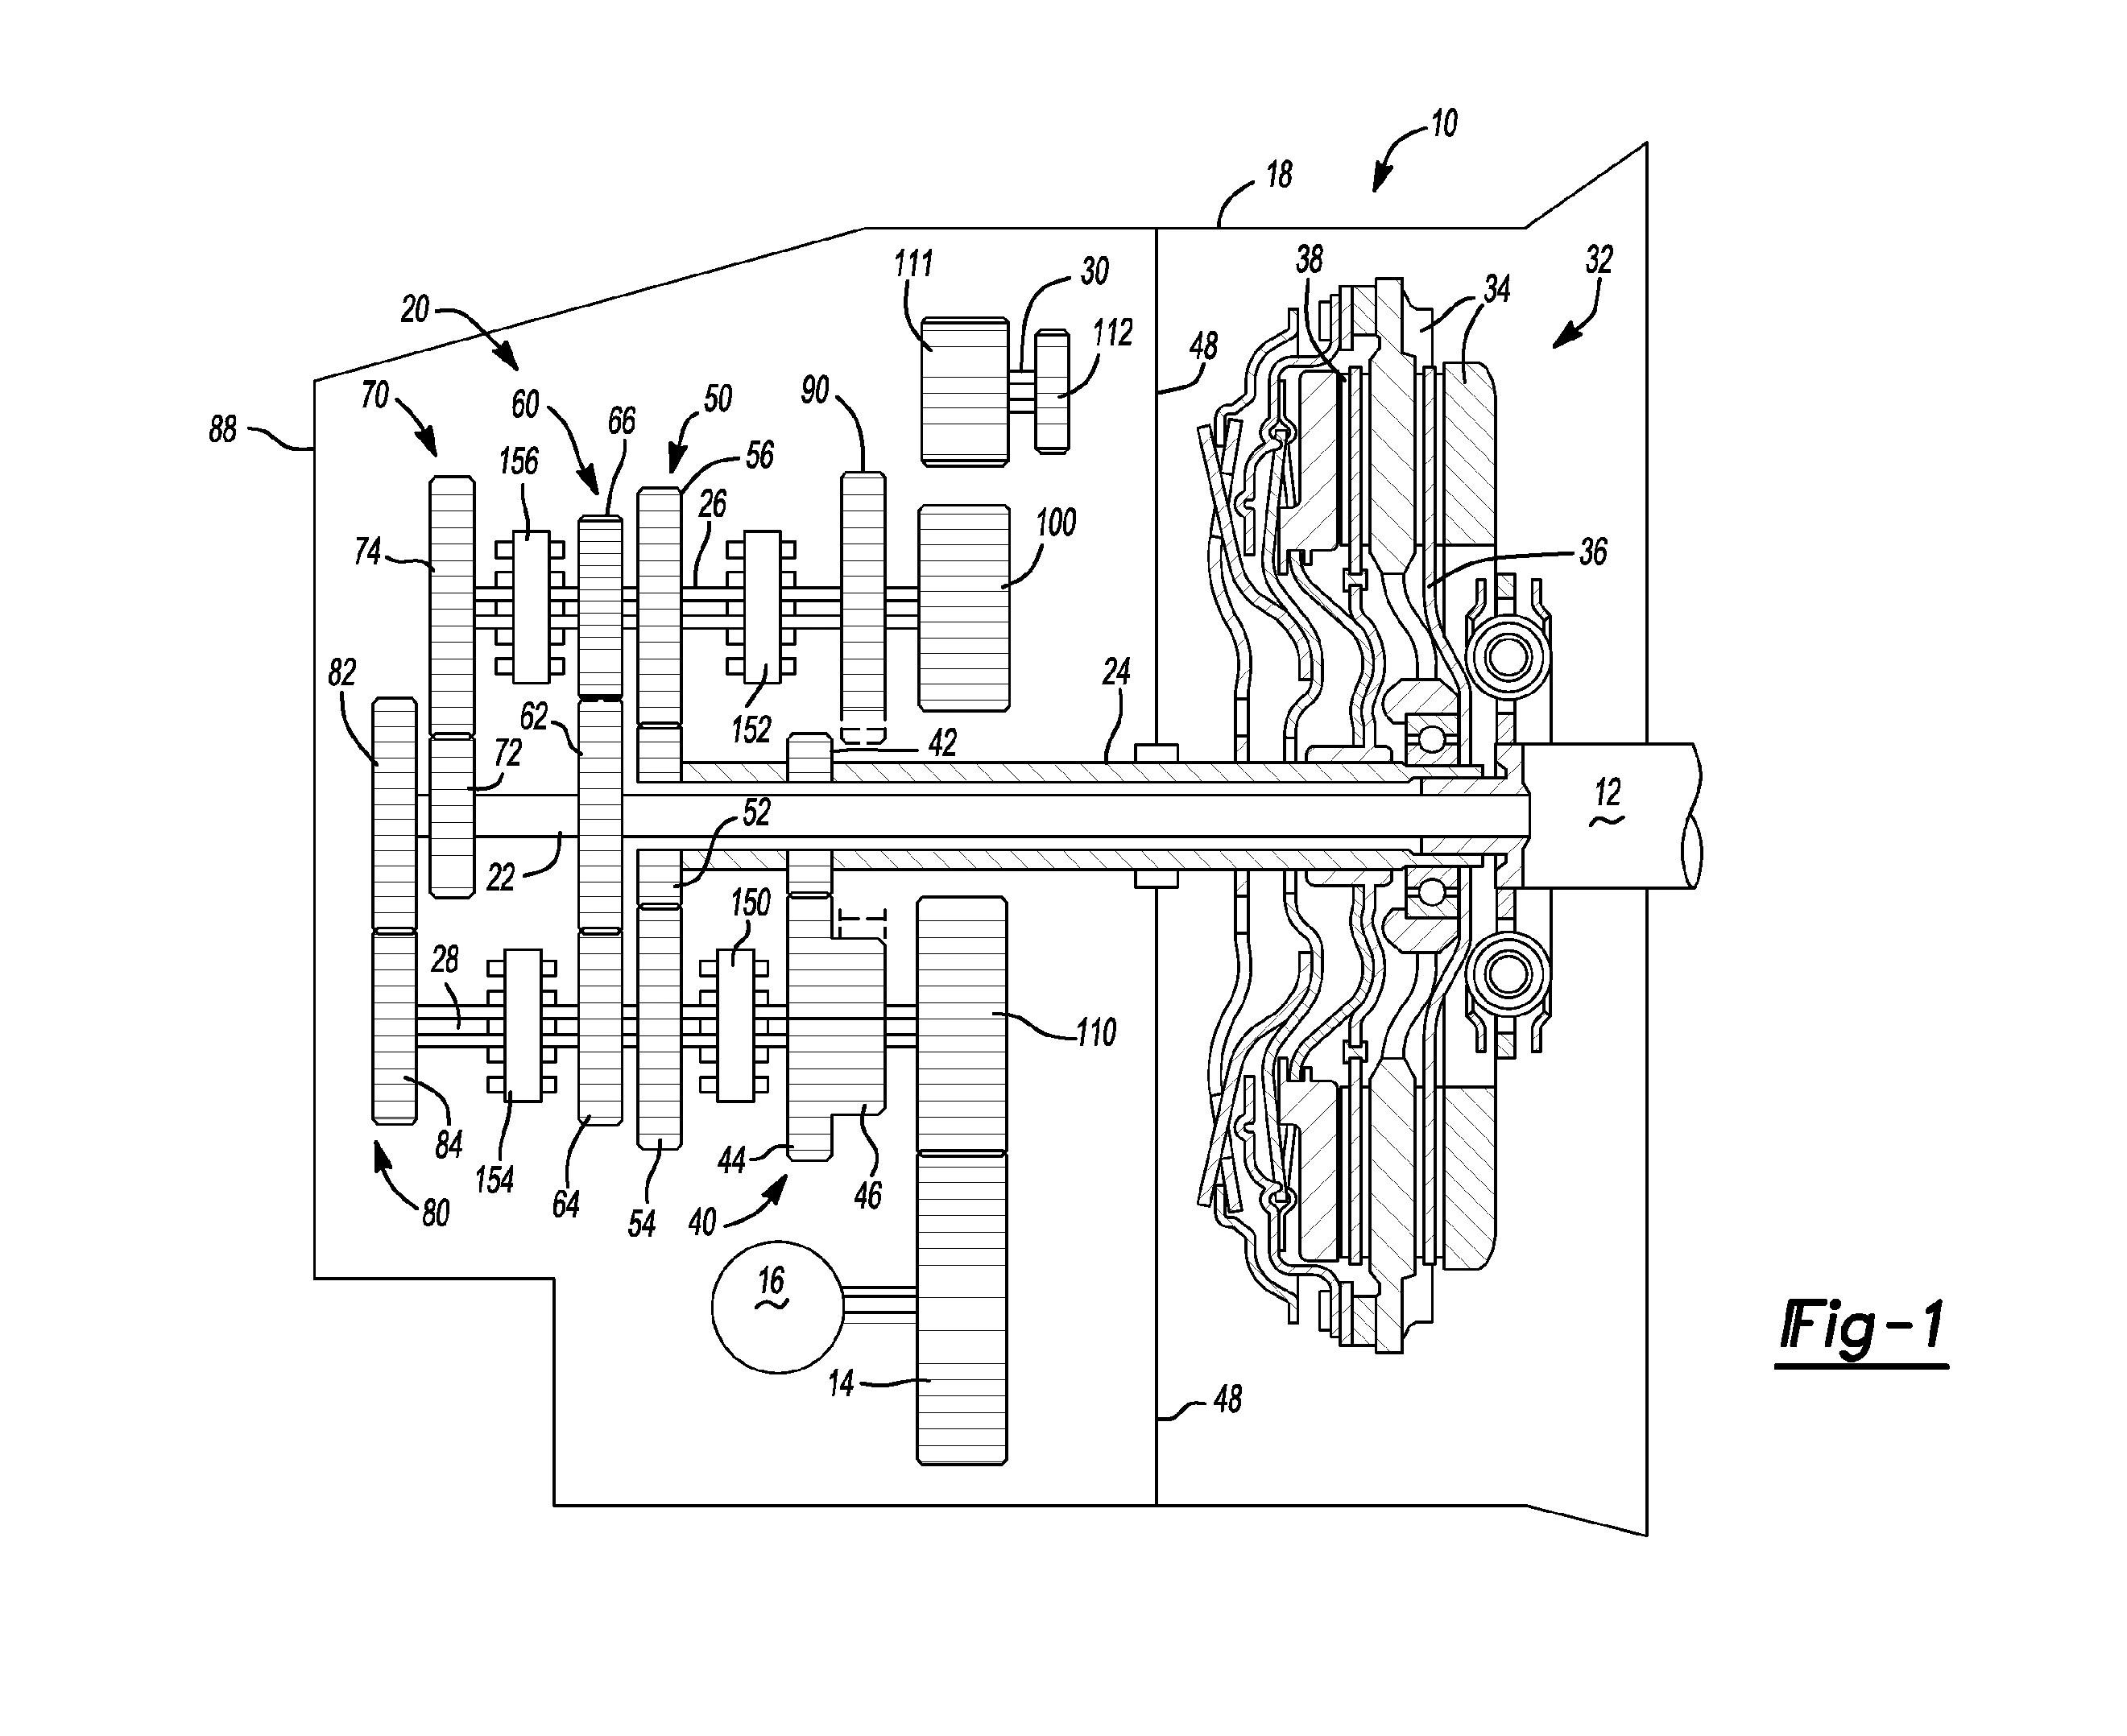 medium resolution of gm dual clutch transmission gm high tech performance suzuki clutch diagram gm clutch diagram